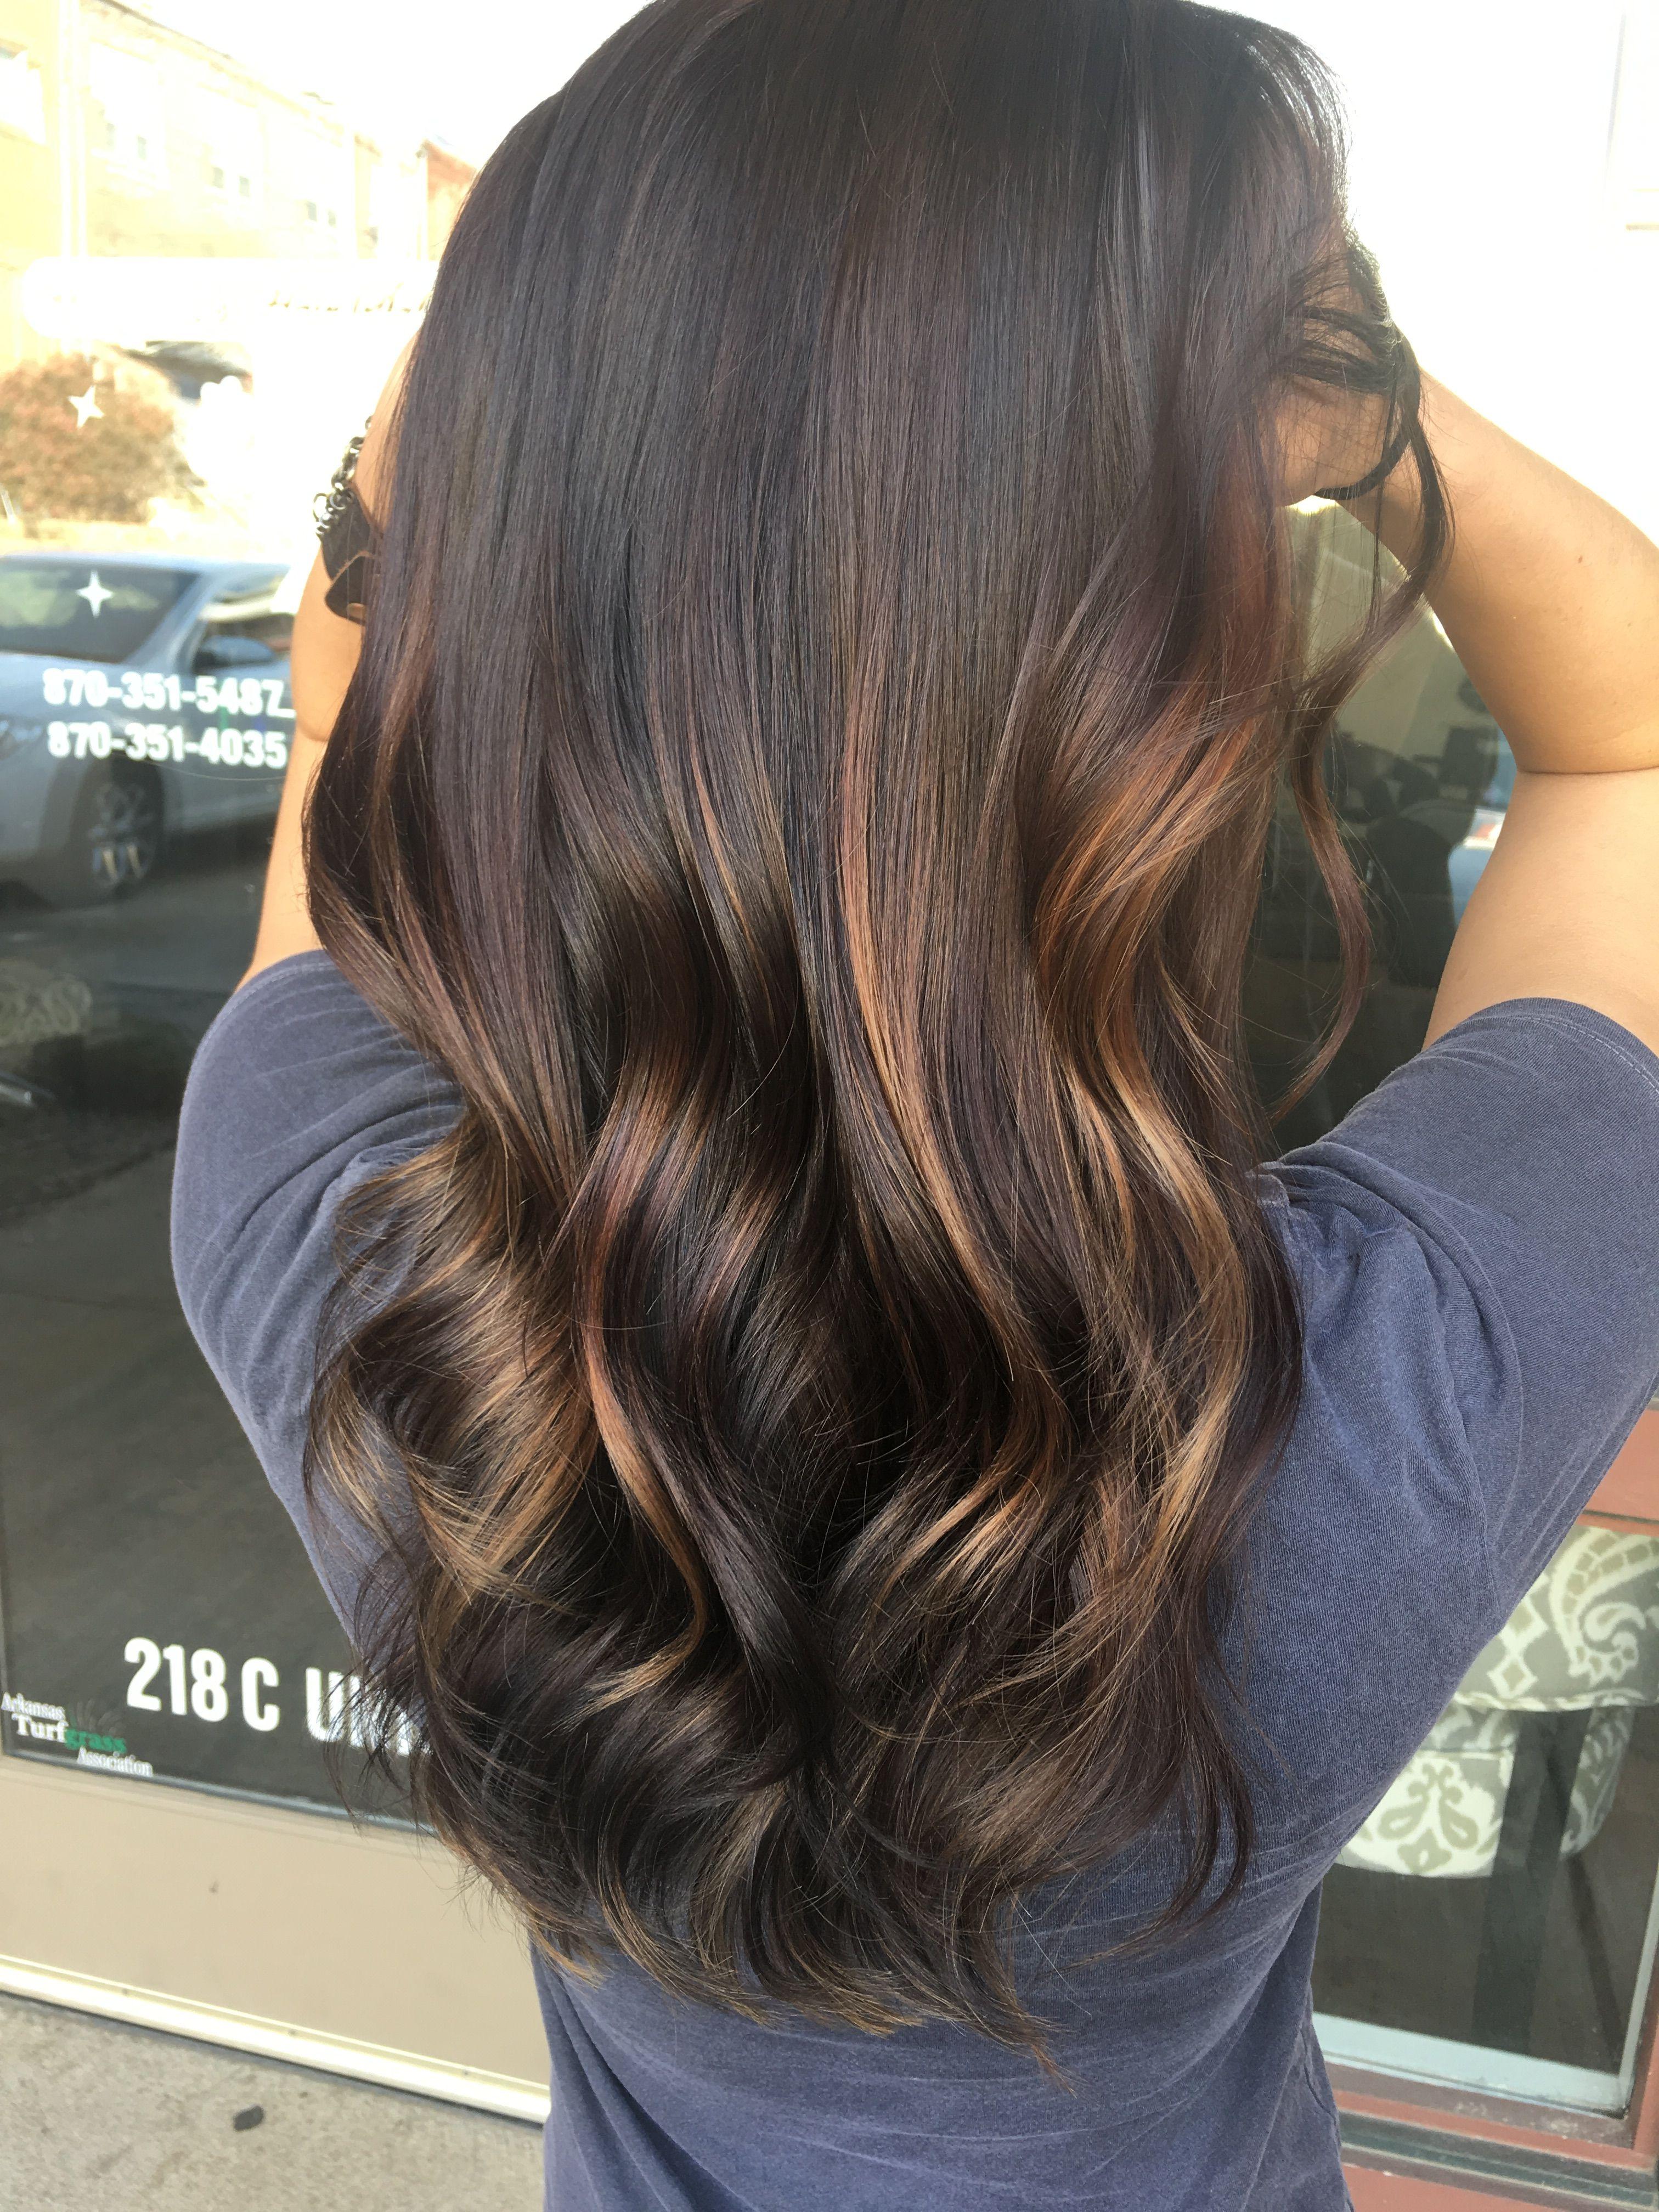 Dark Brunette Balayage Caramel Lowlights Balayage Brunette Dark Hair With Lowlights Balayage Hair Dark